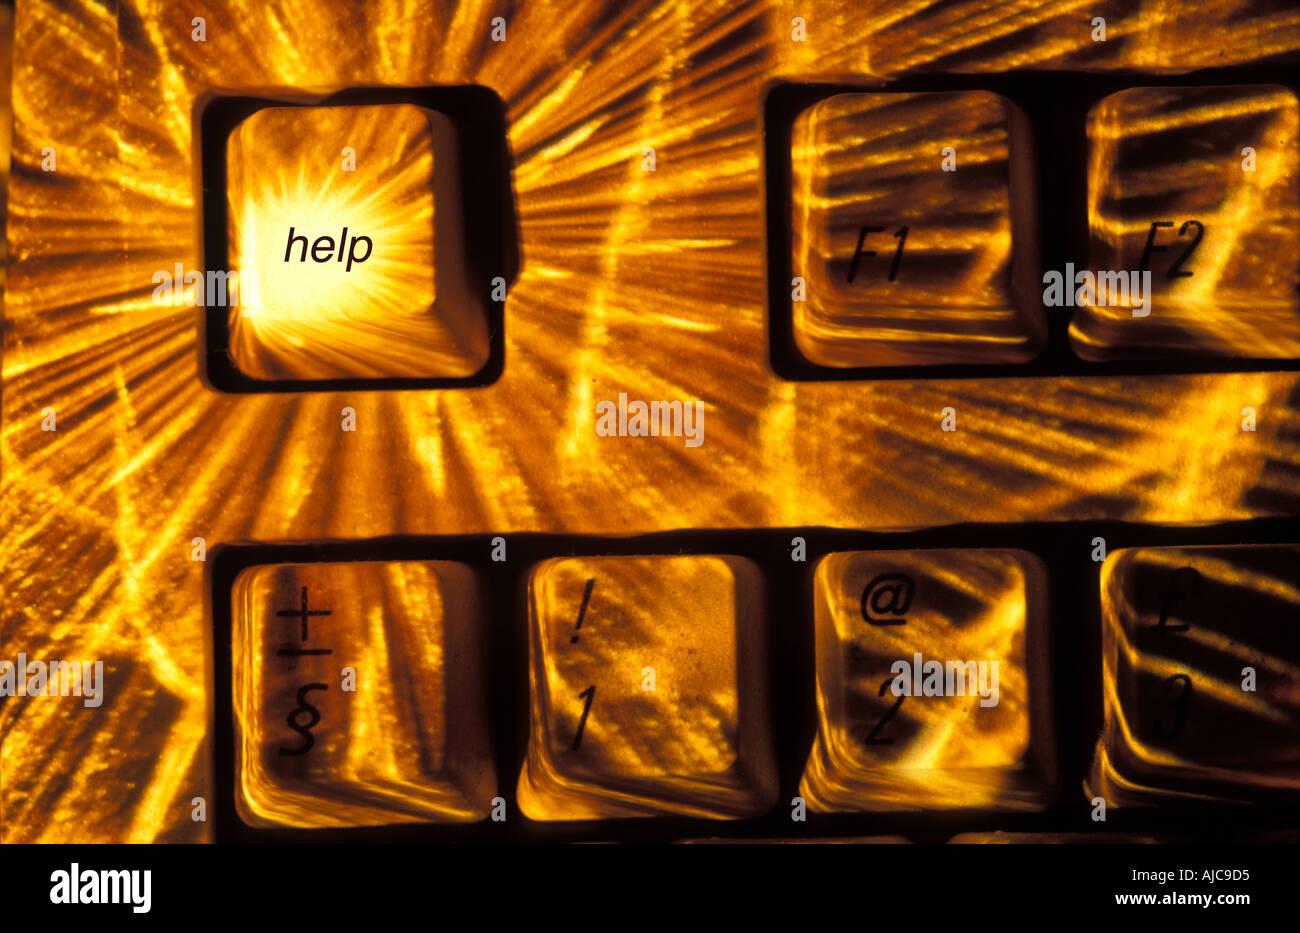 A sunburst focused on the help key of a keyboard 'digitally enhanced' image help inserted onto key - Stock Image